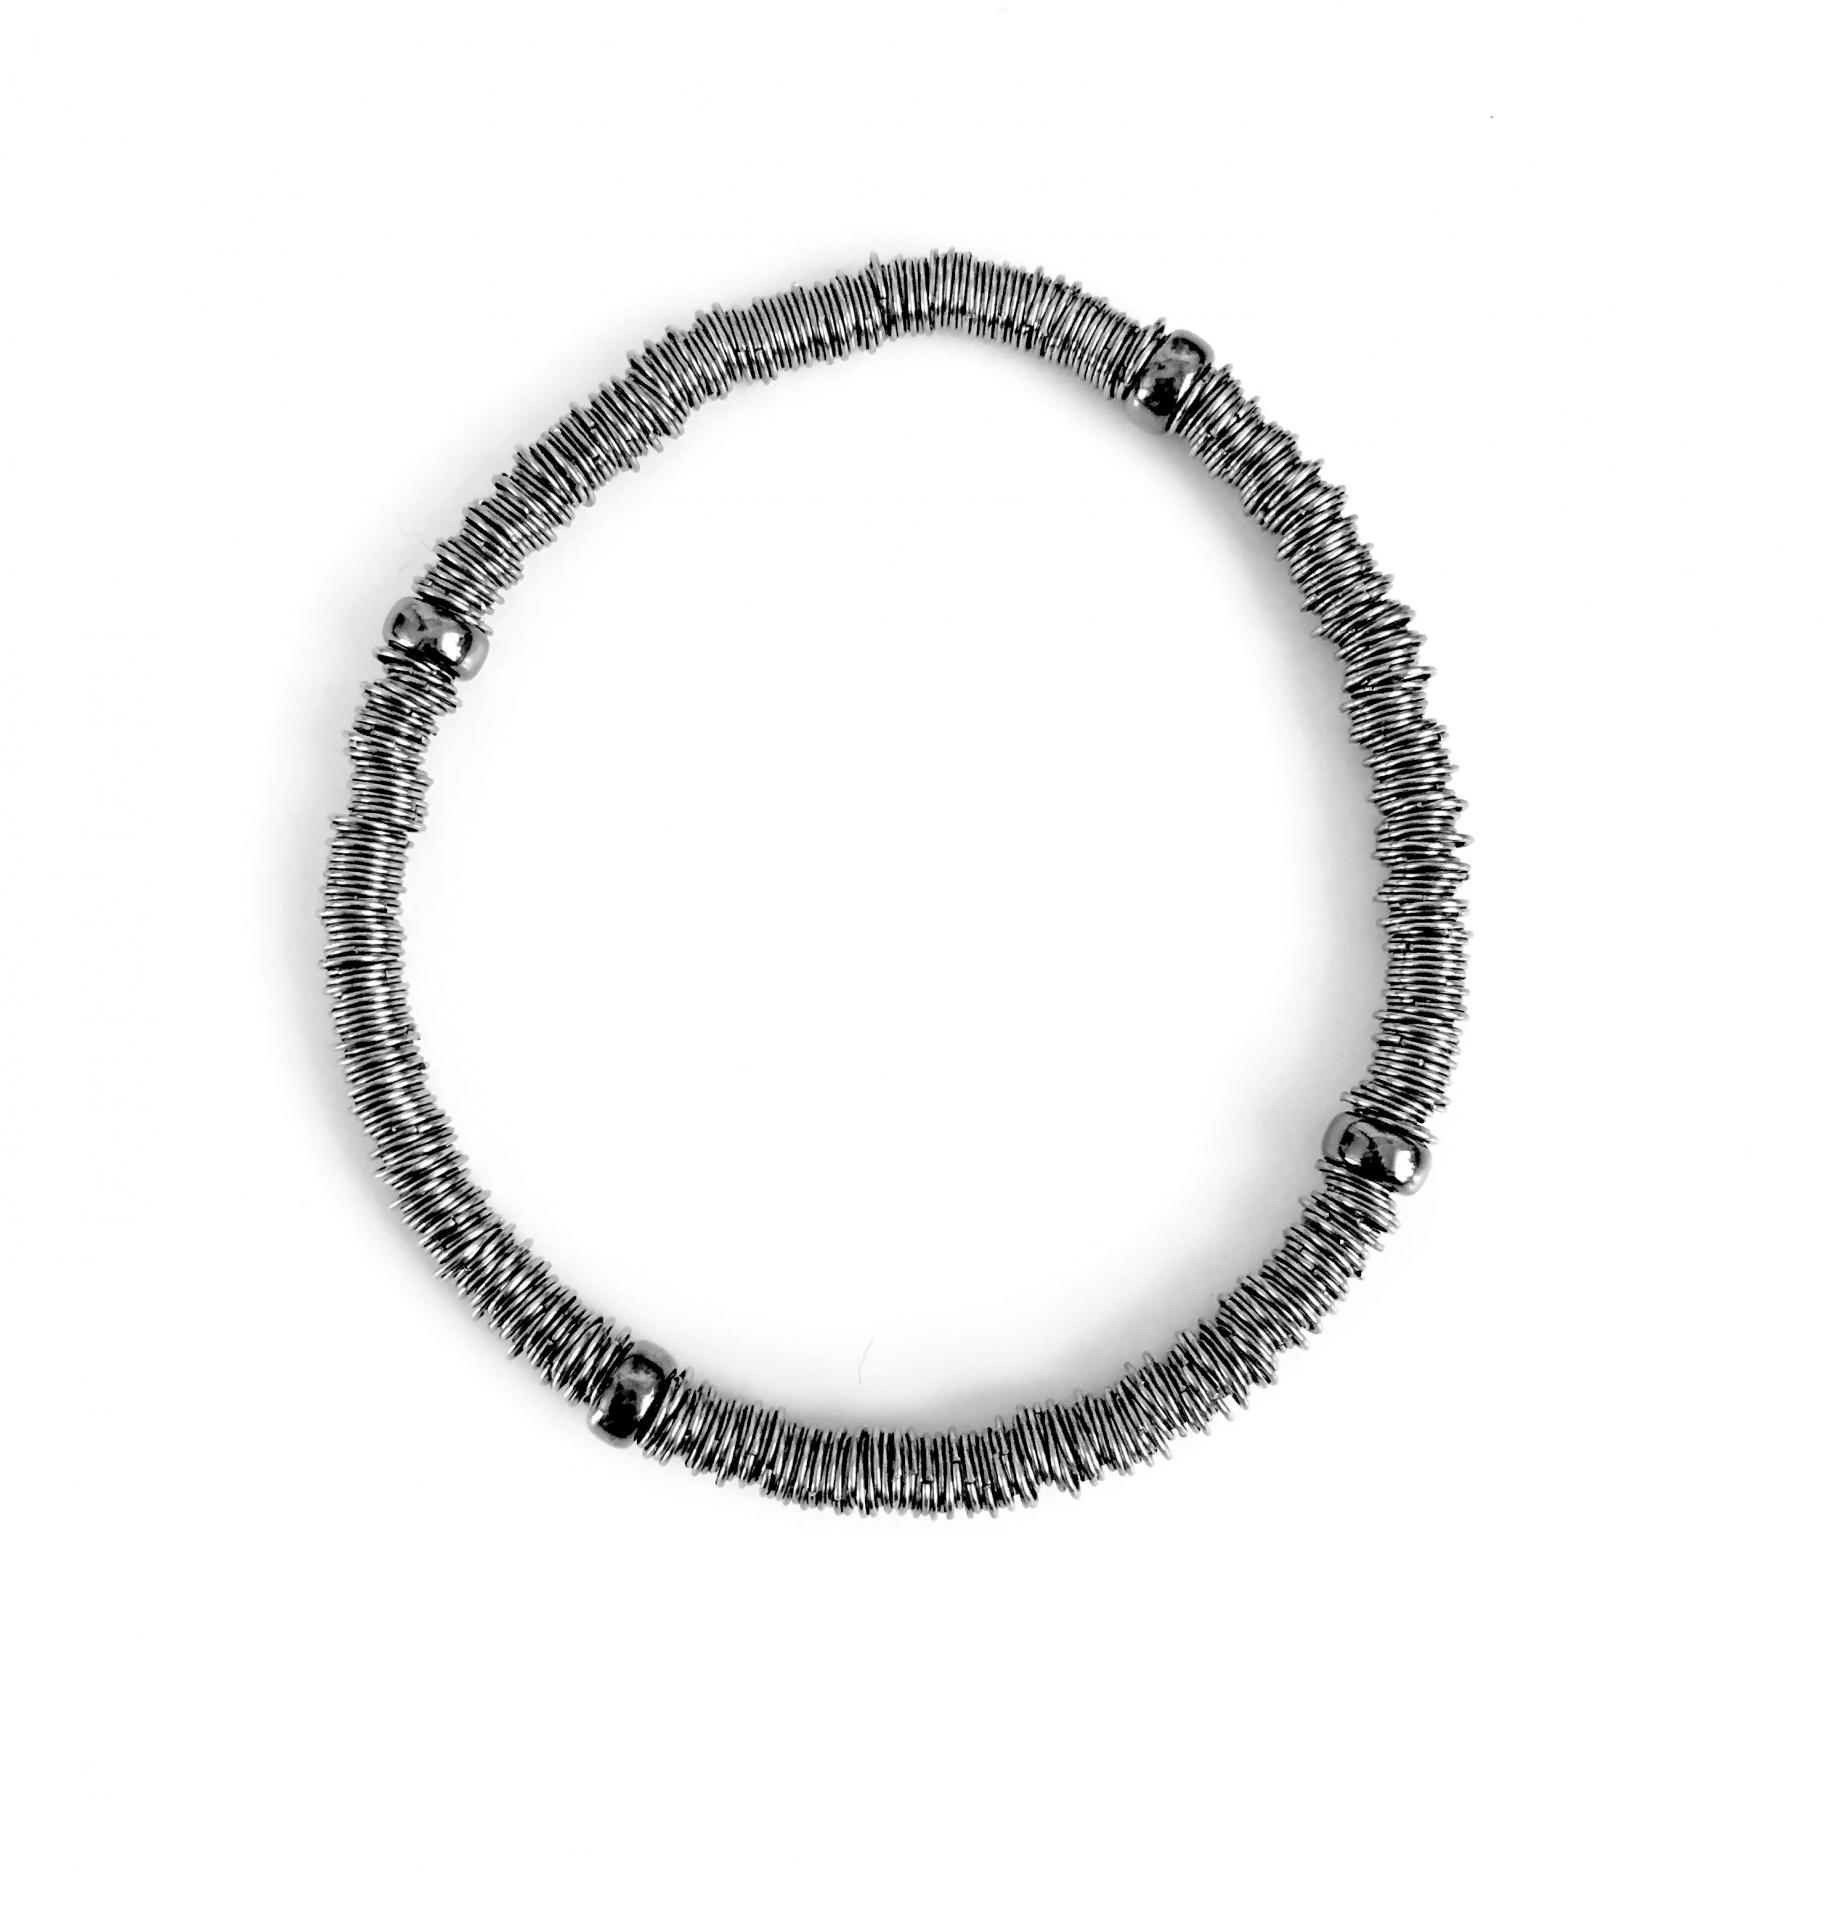 Pulsera elástica de plata rodiada con bolas bañadas en rutenio